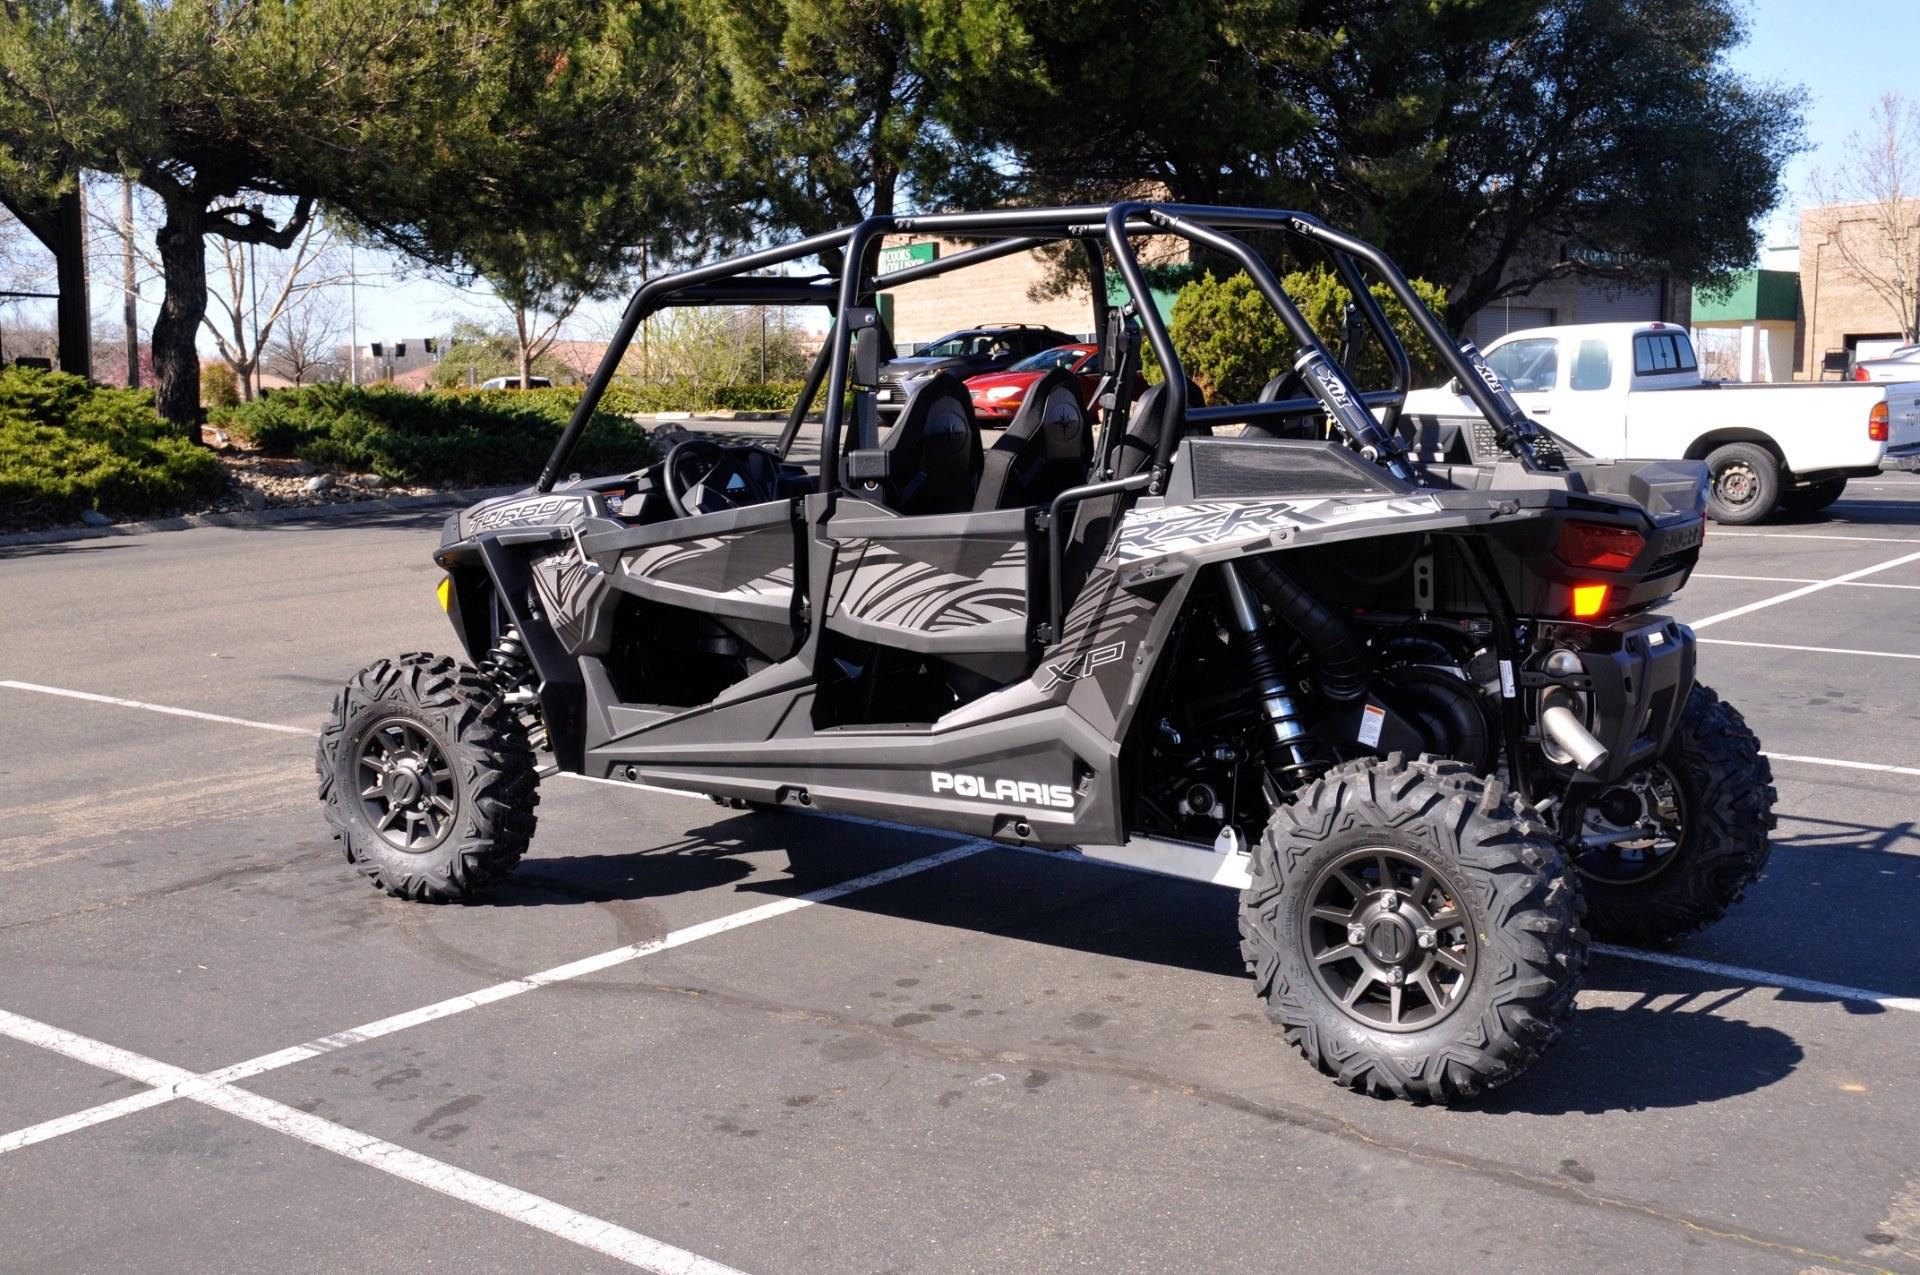 2017 Polaris RZR XP 4 Turbo EPS in Roseville, California